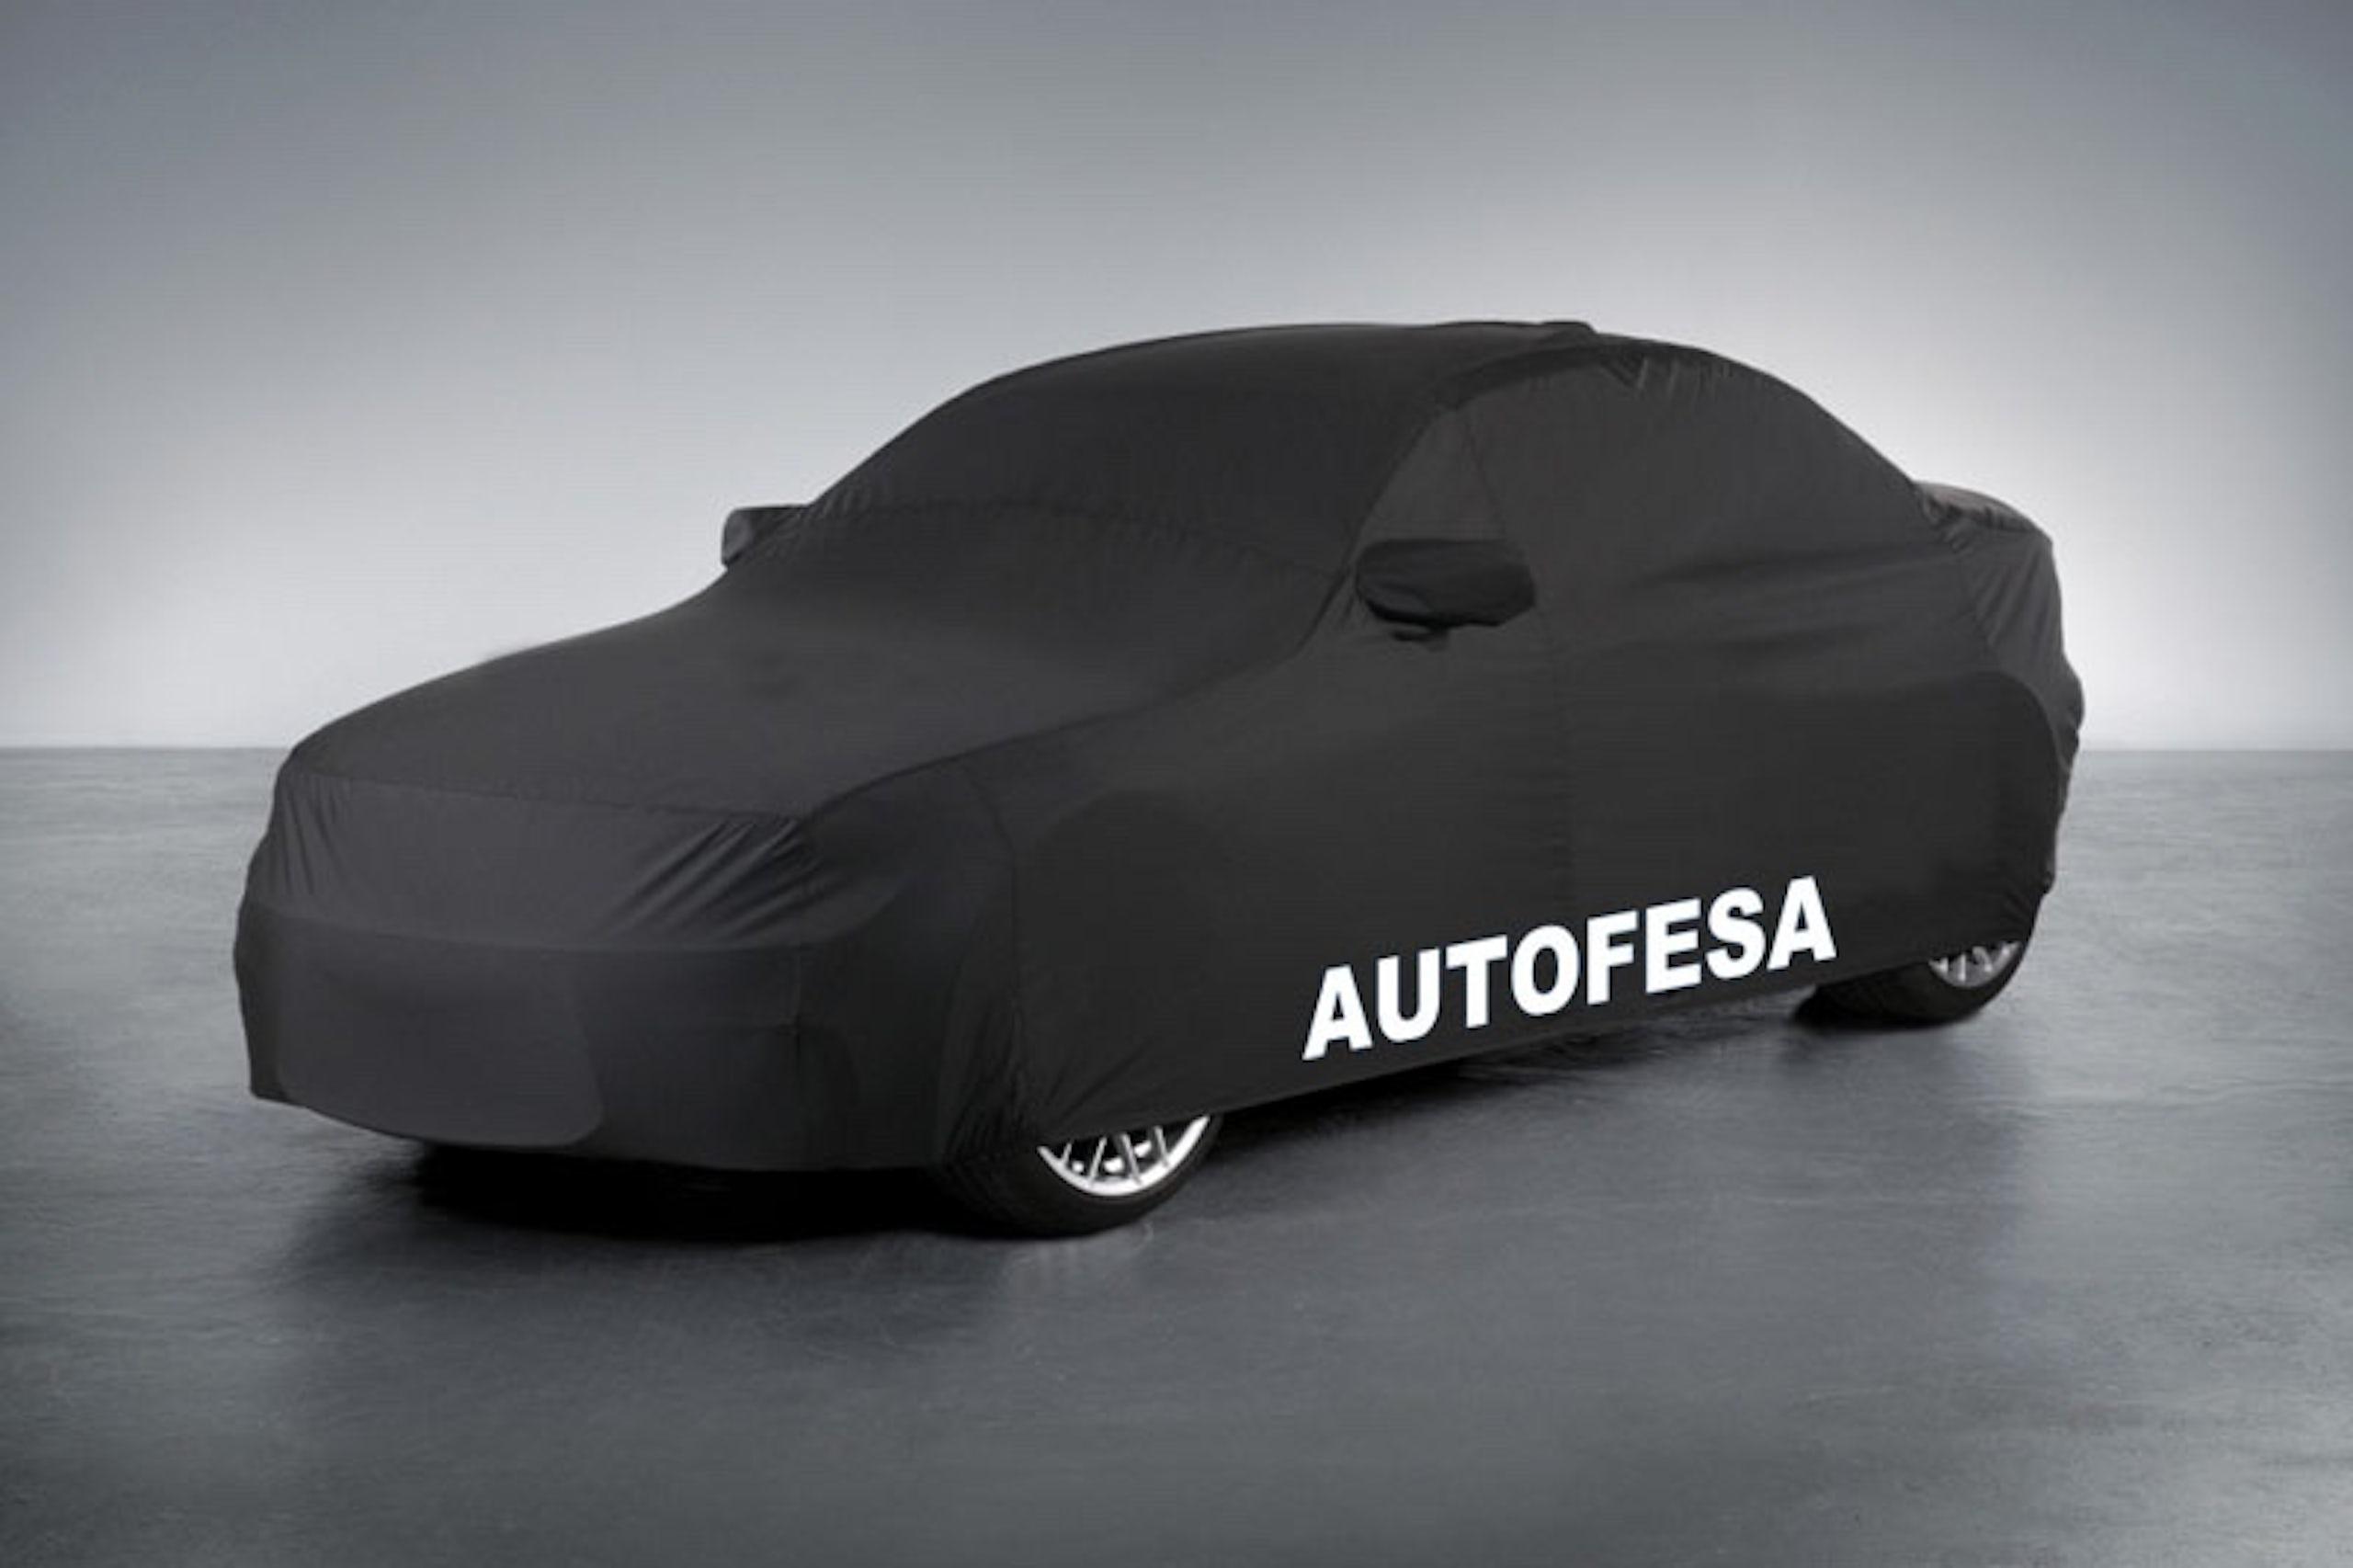 Audi A6 A6Avant COMPETITION ABT 3.0 TDI V6 T 326cv quattro 5p S tronic 4x4 Cpmpetition ABT S/S - Foto 30